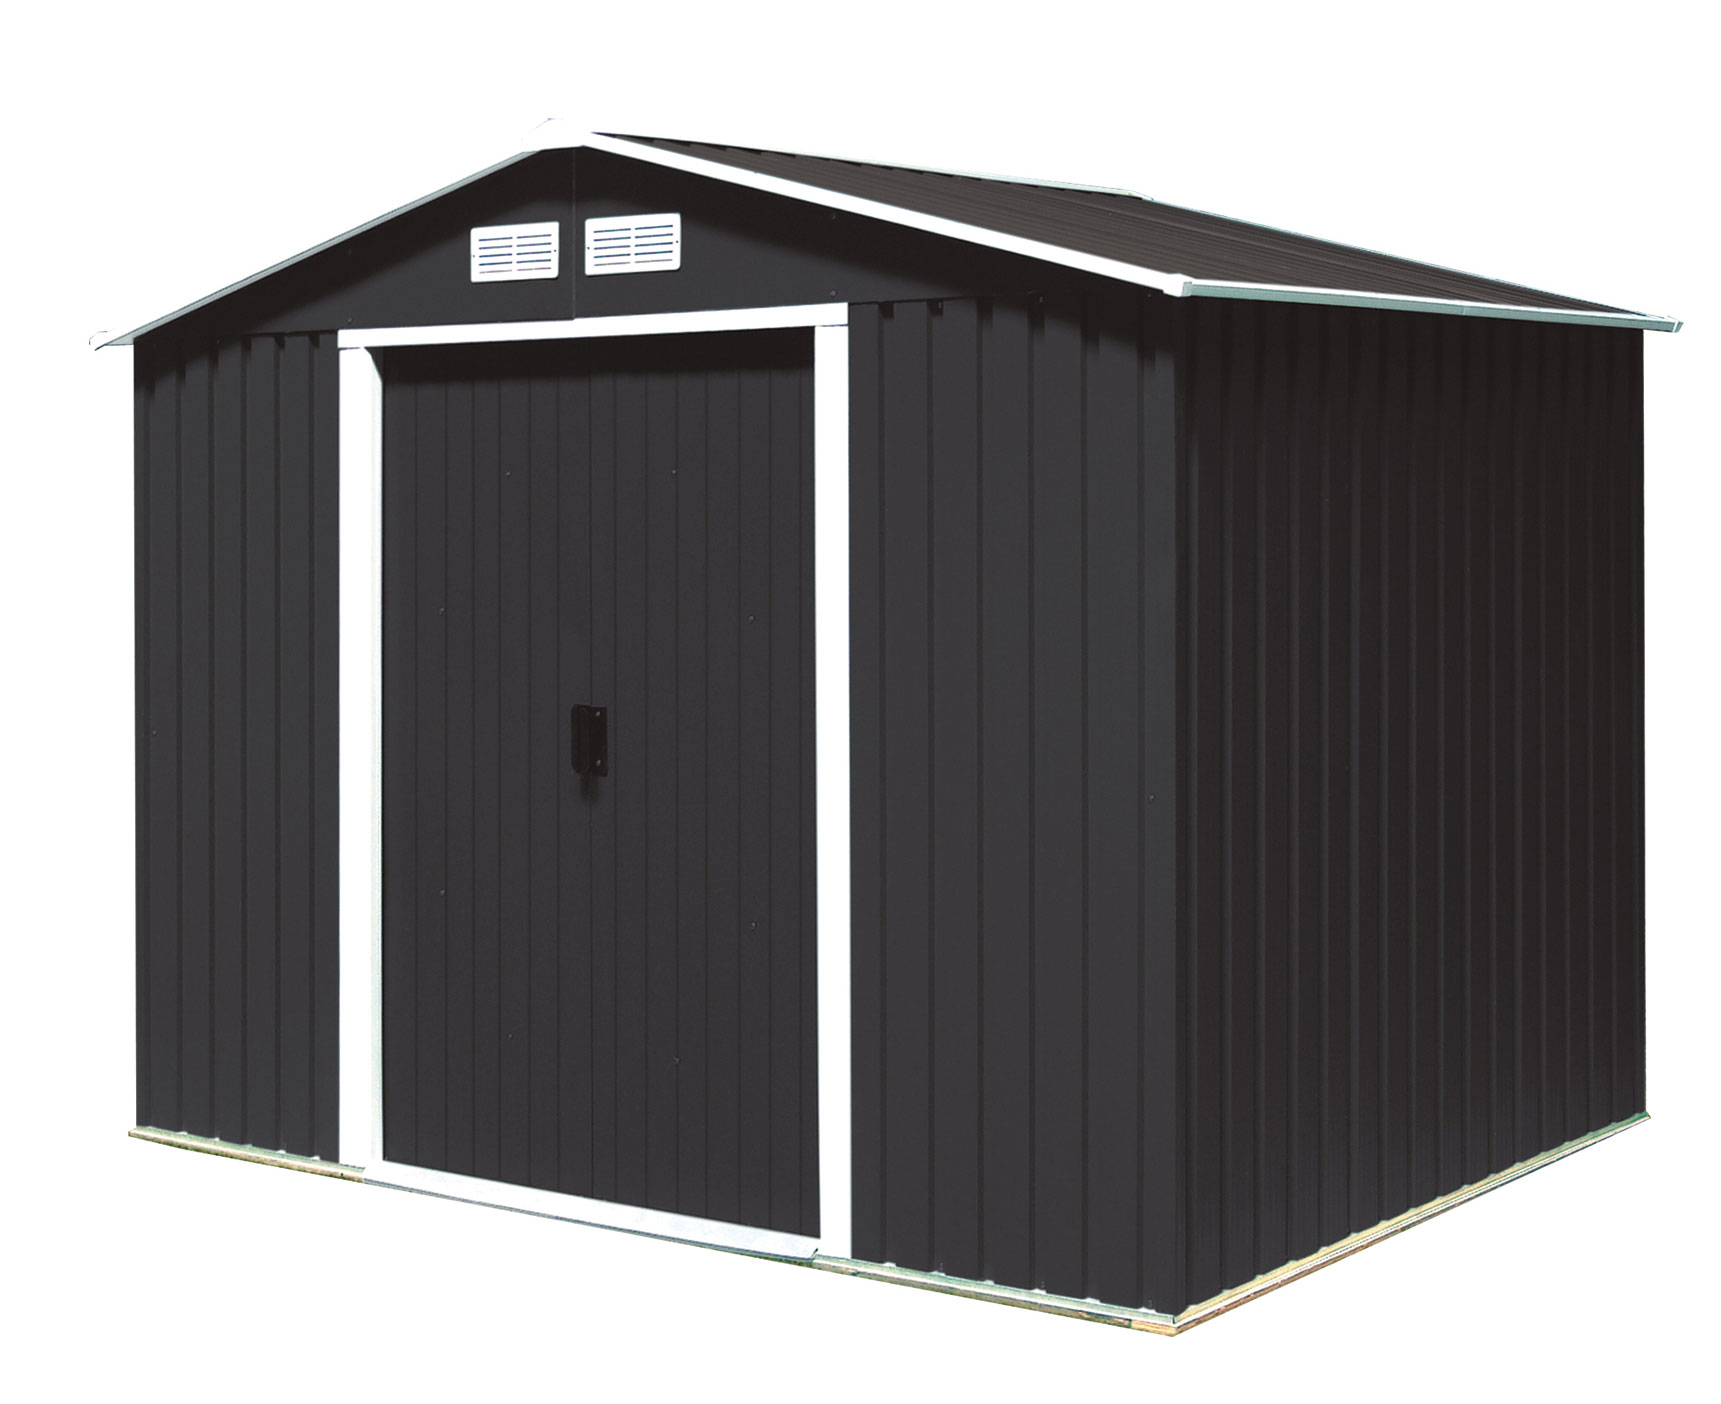 duramax ger tehaus metall titan 8x6 anthrazit 261 2x182 2cm bei. Black Bedroom Furniture Sets. Home Design Ideas